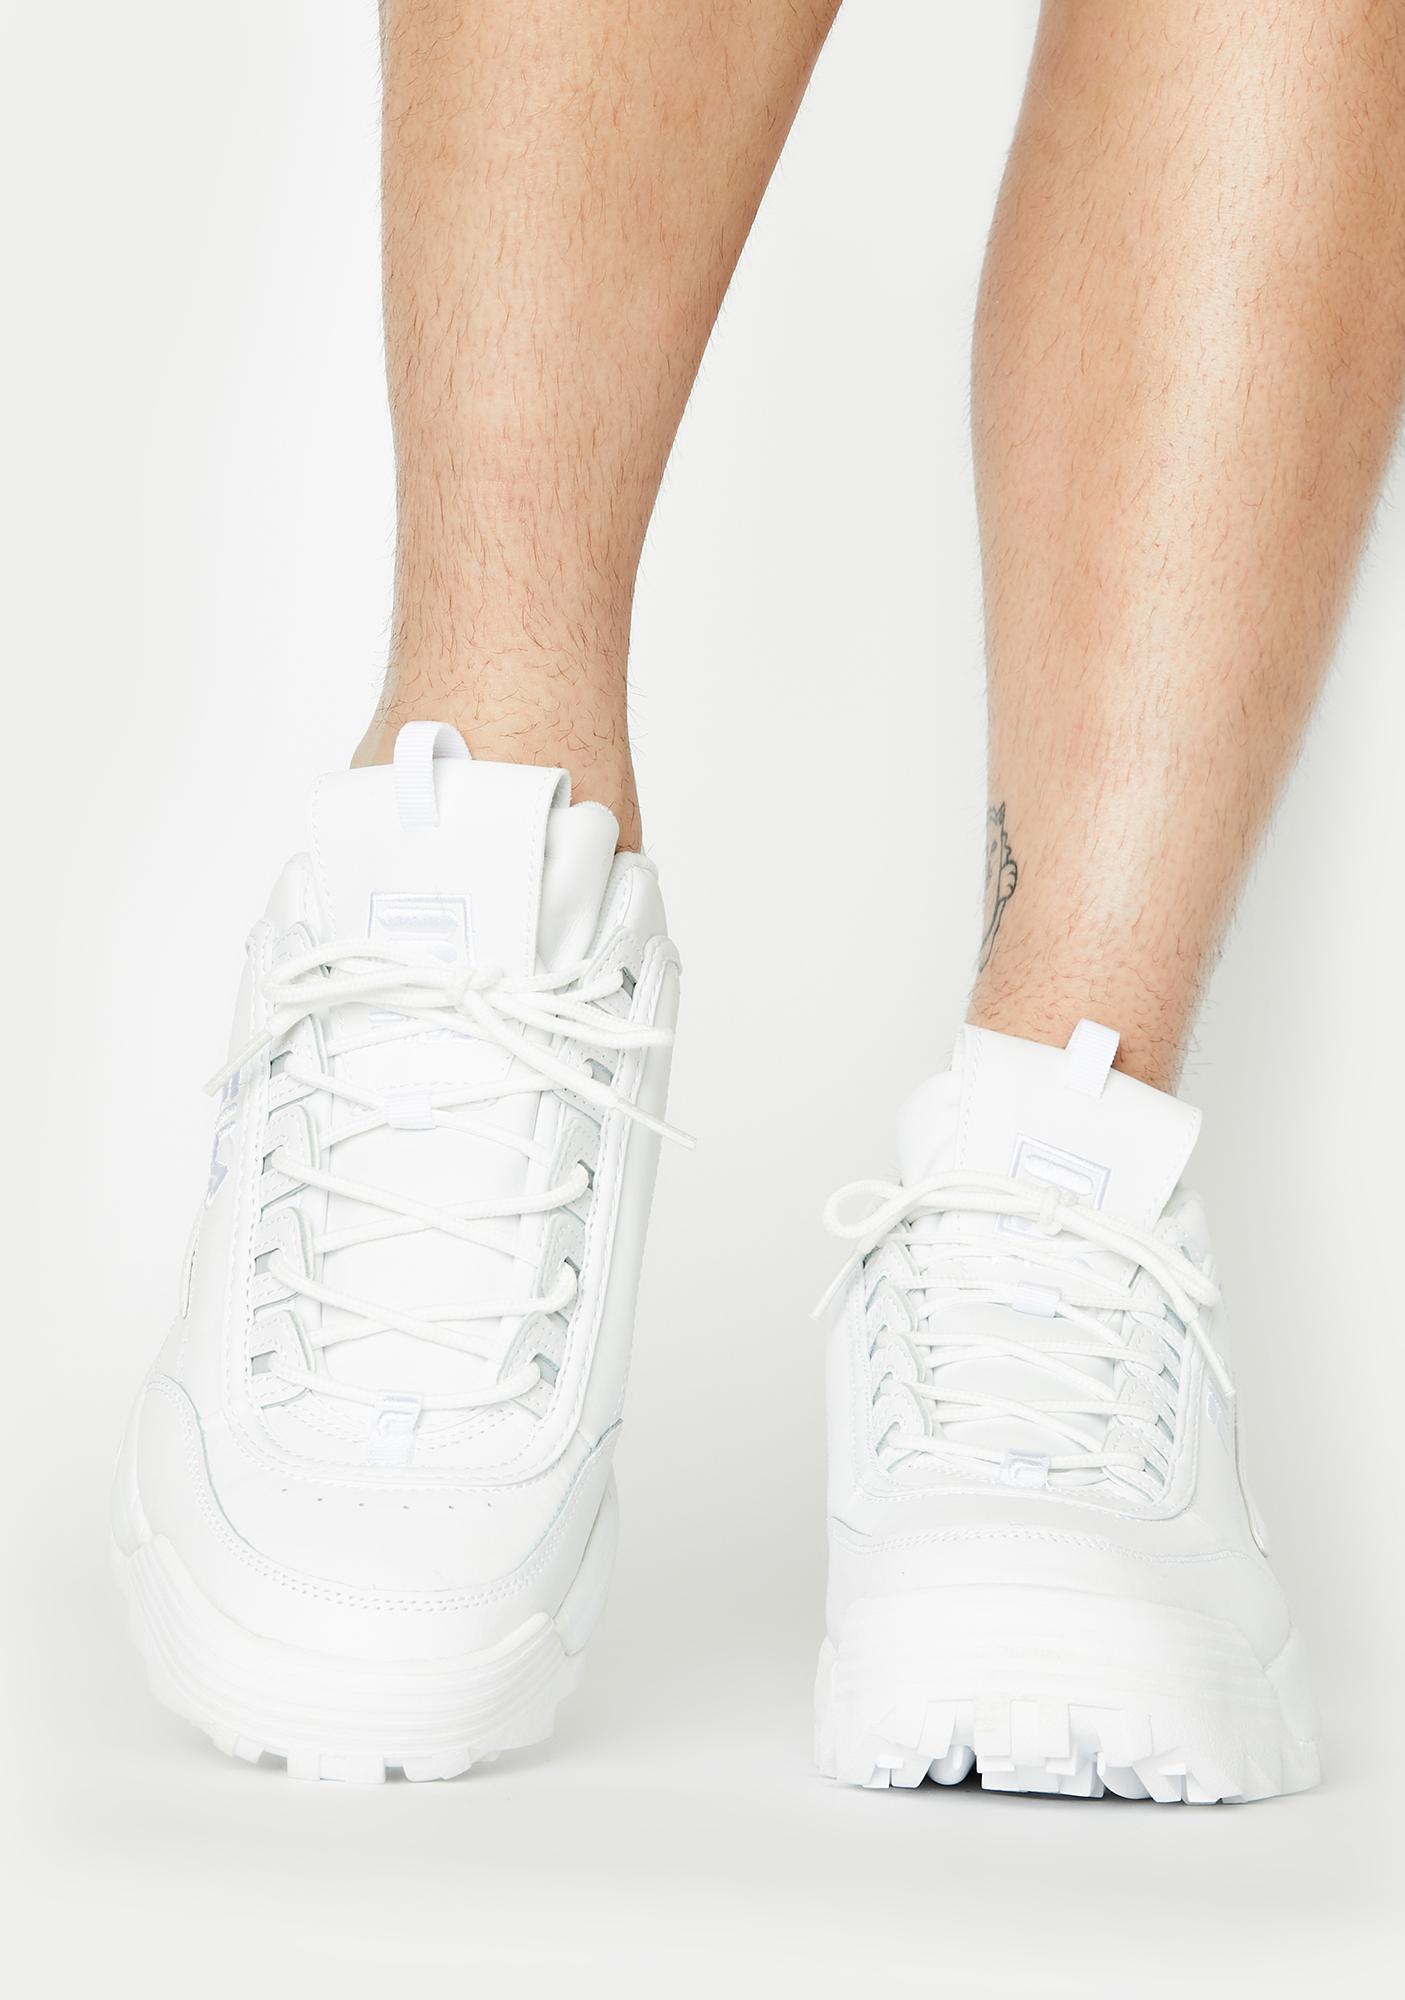 Fila Unisex Tonal Disruptor 2 Premium Sneakers